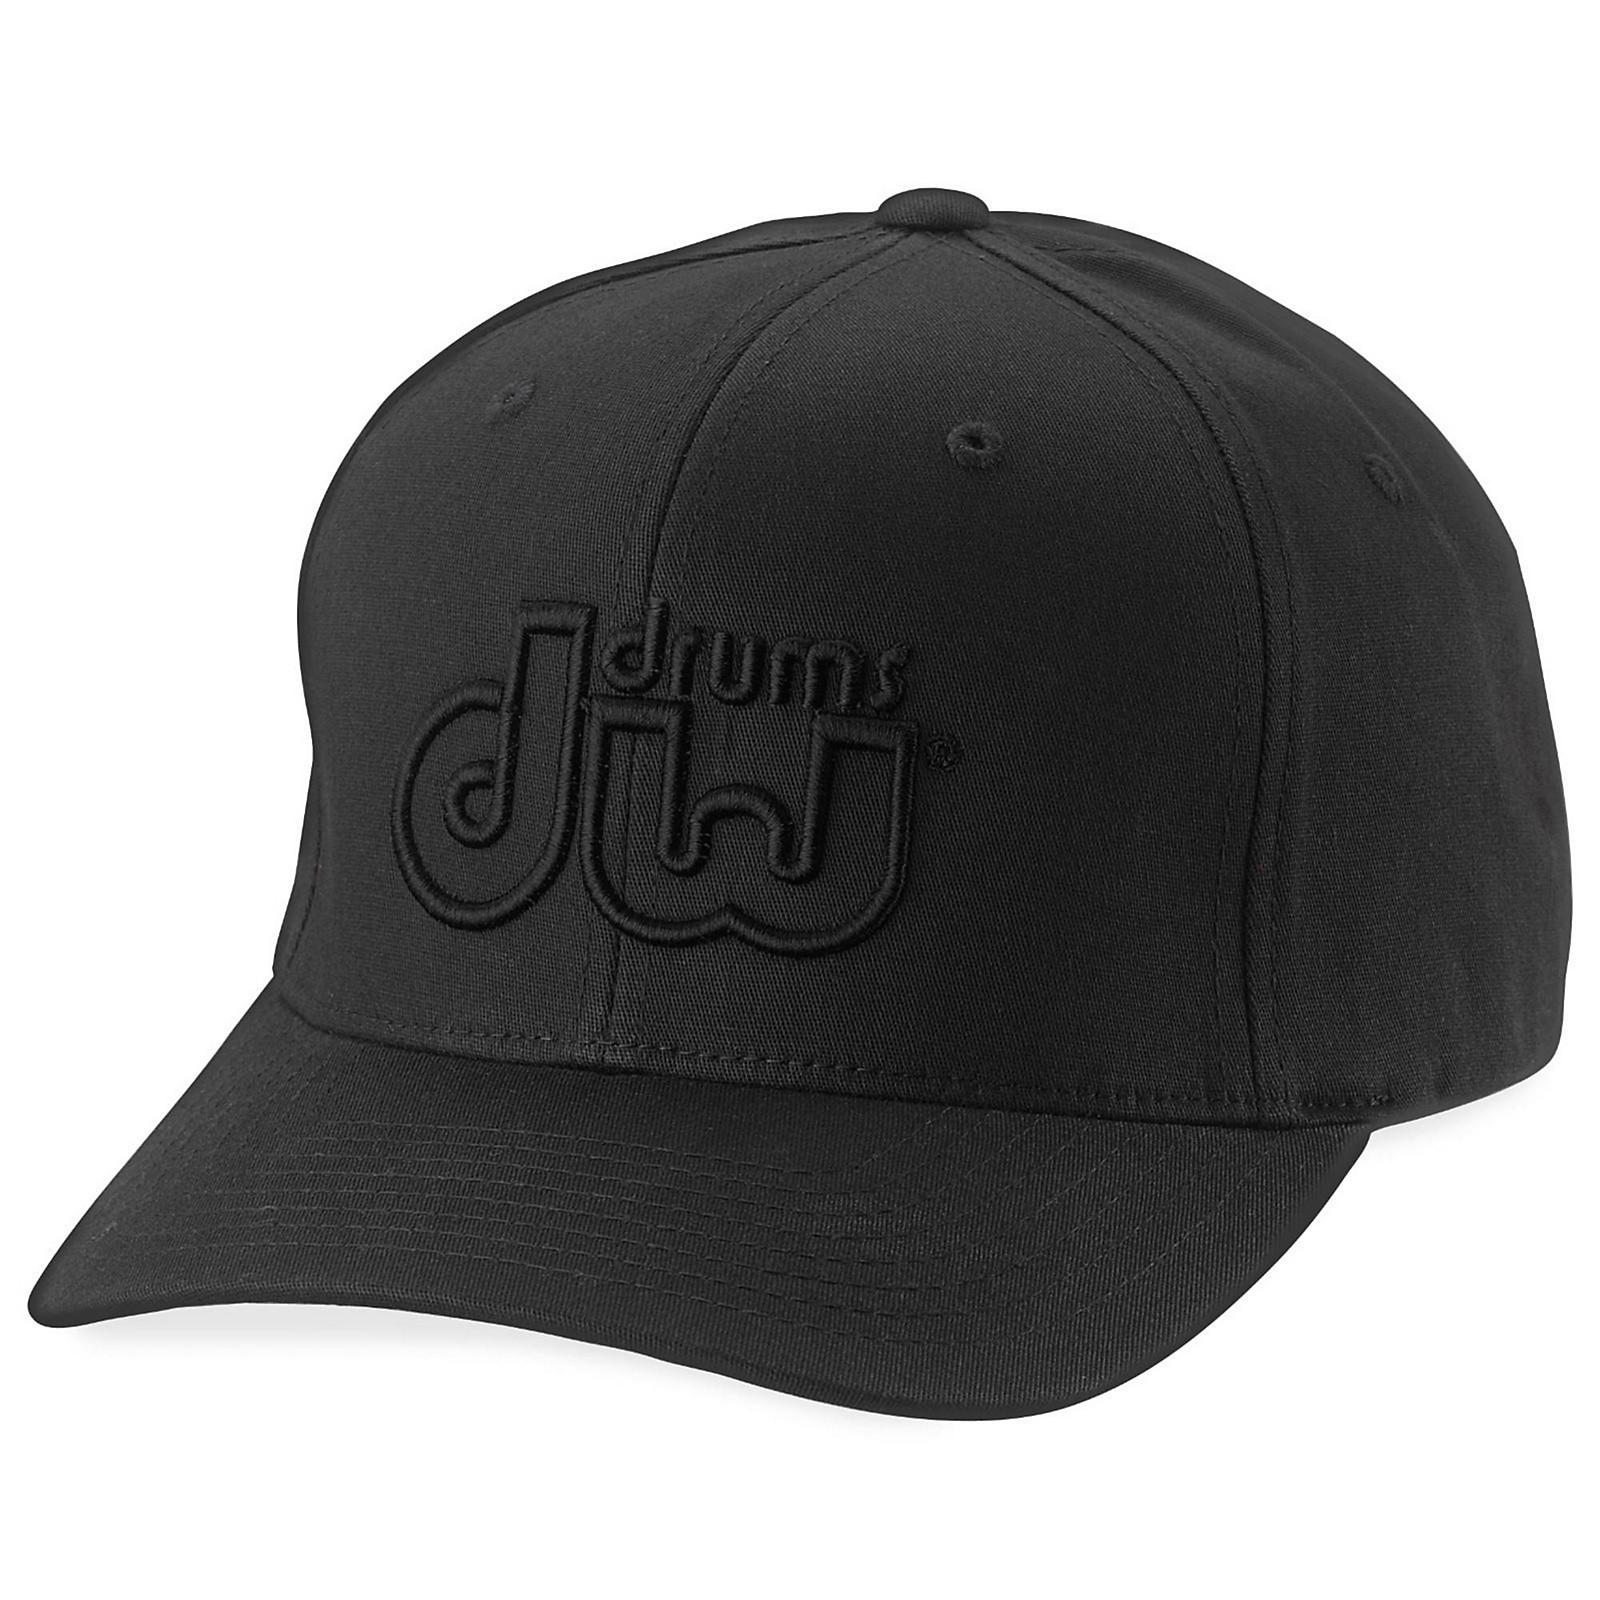 DW Performance Hat Black On Black Small/Medium